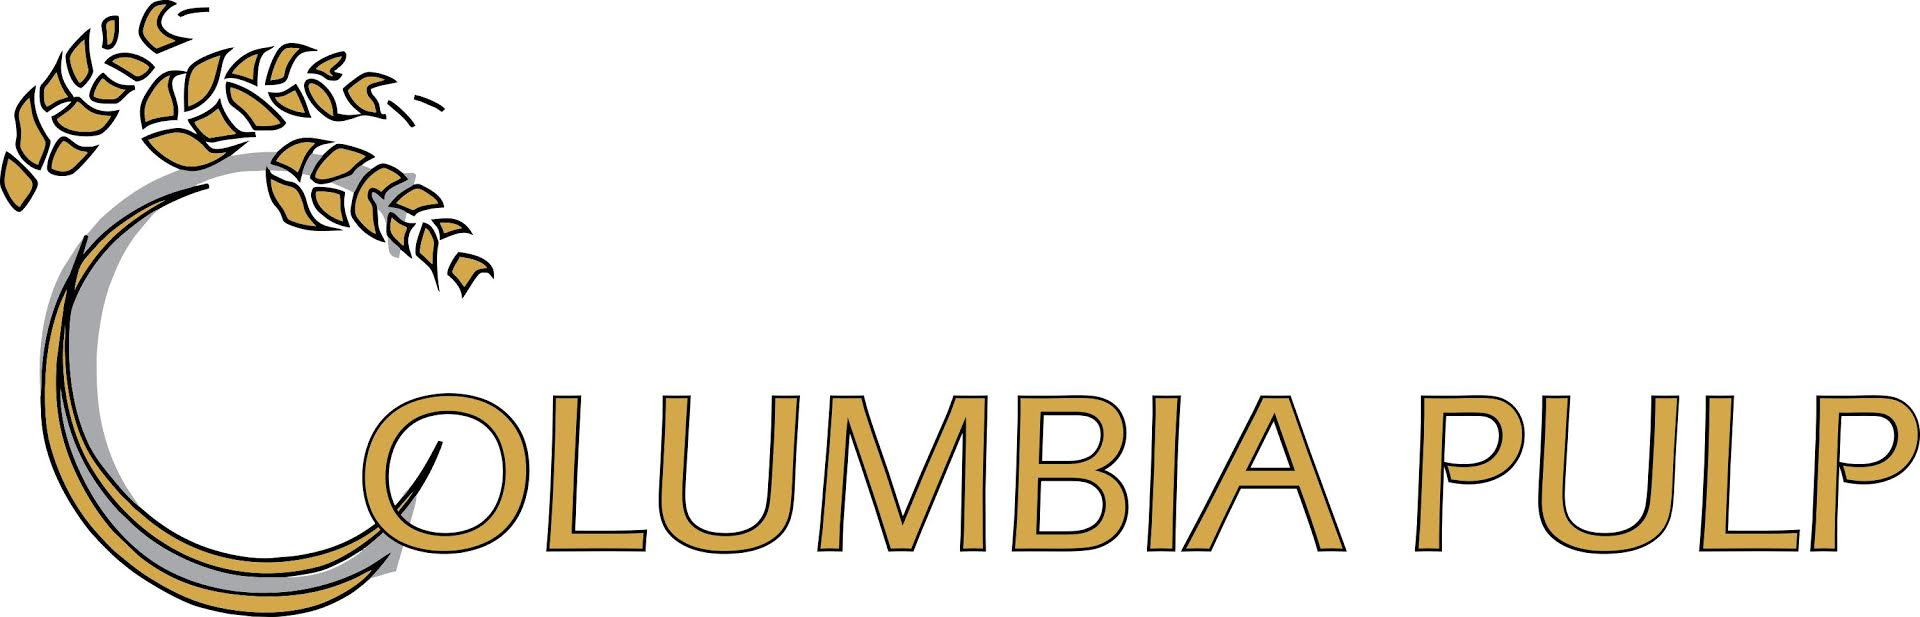 Columbia Pulp.jpg